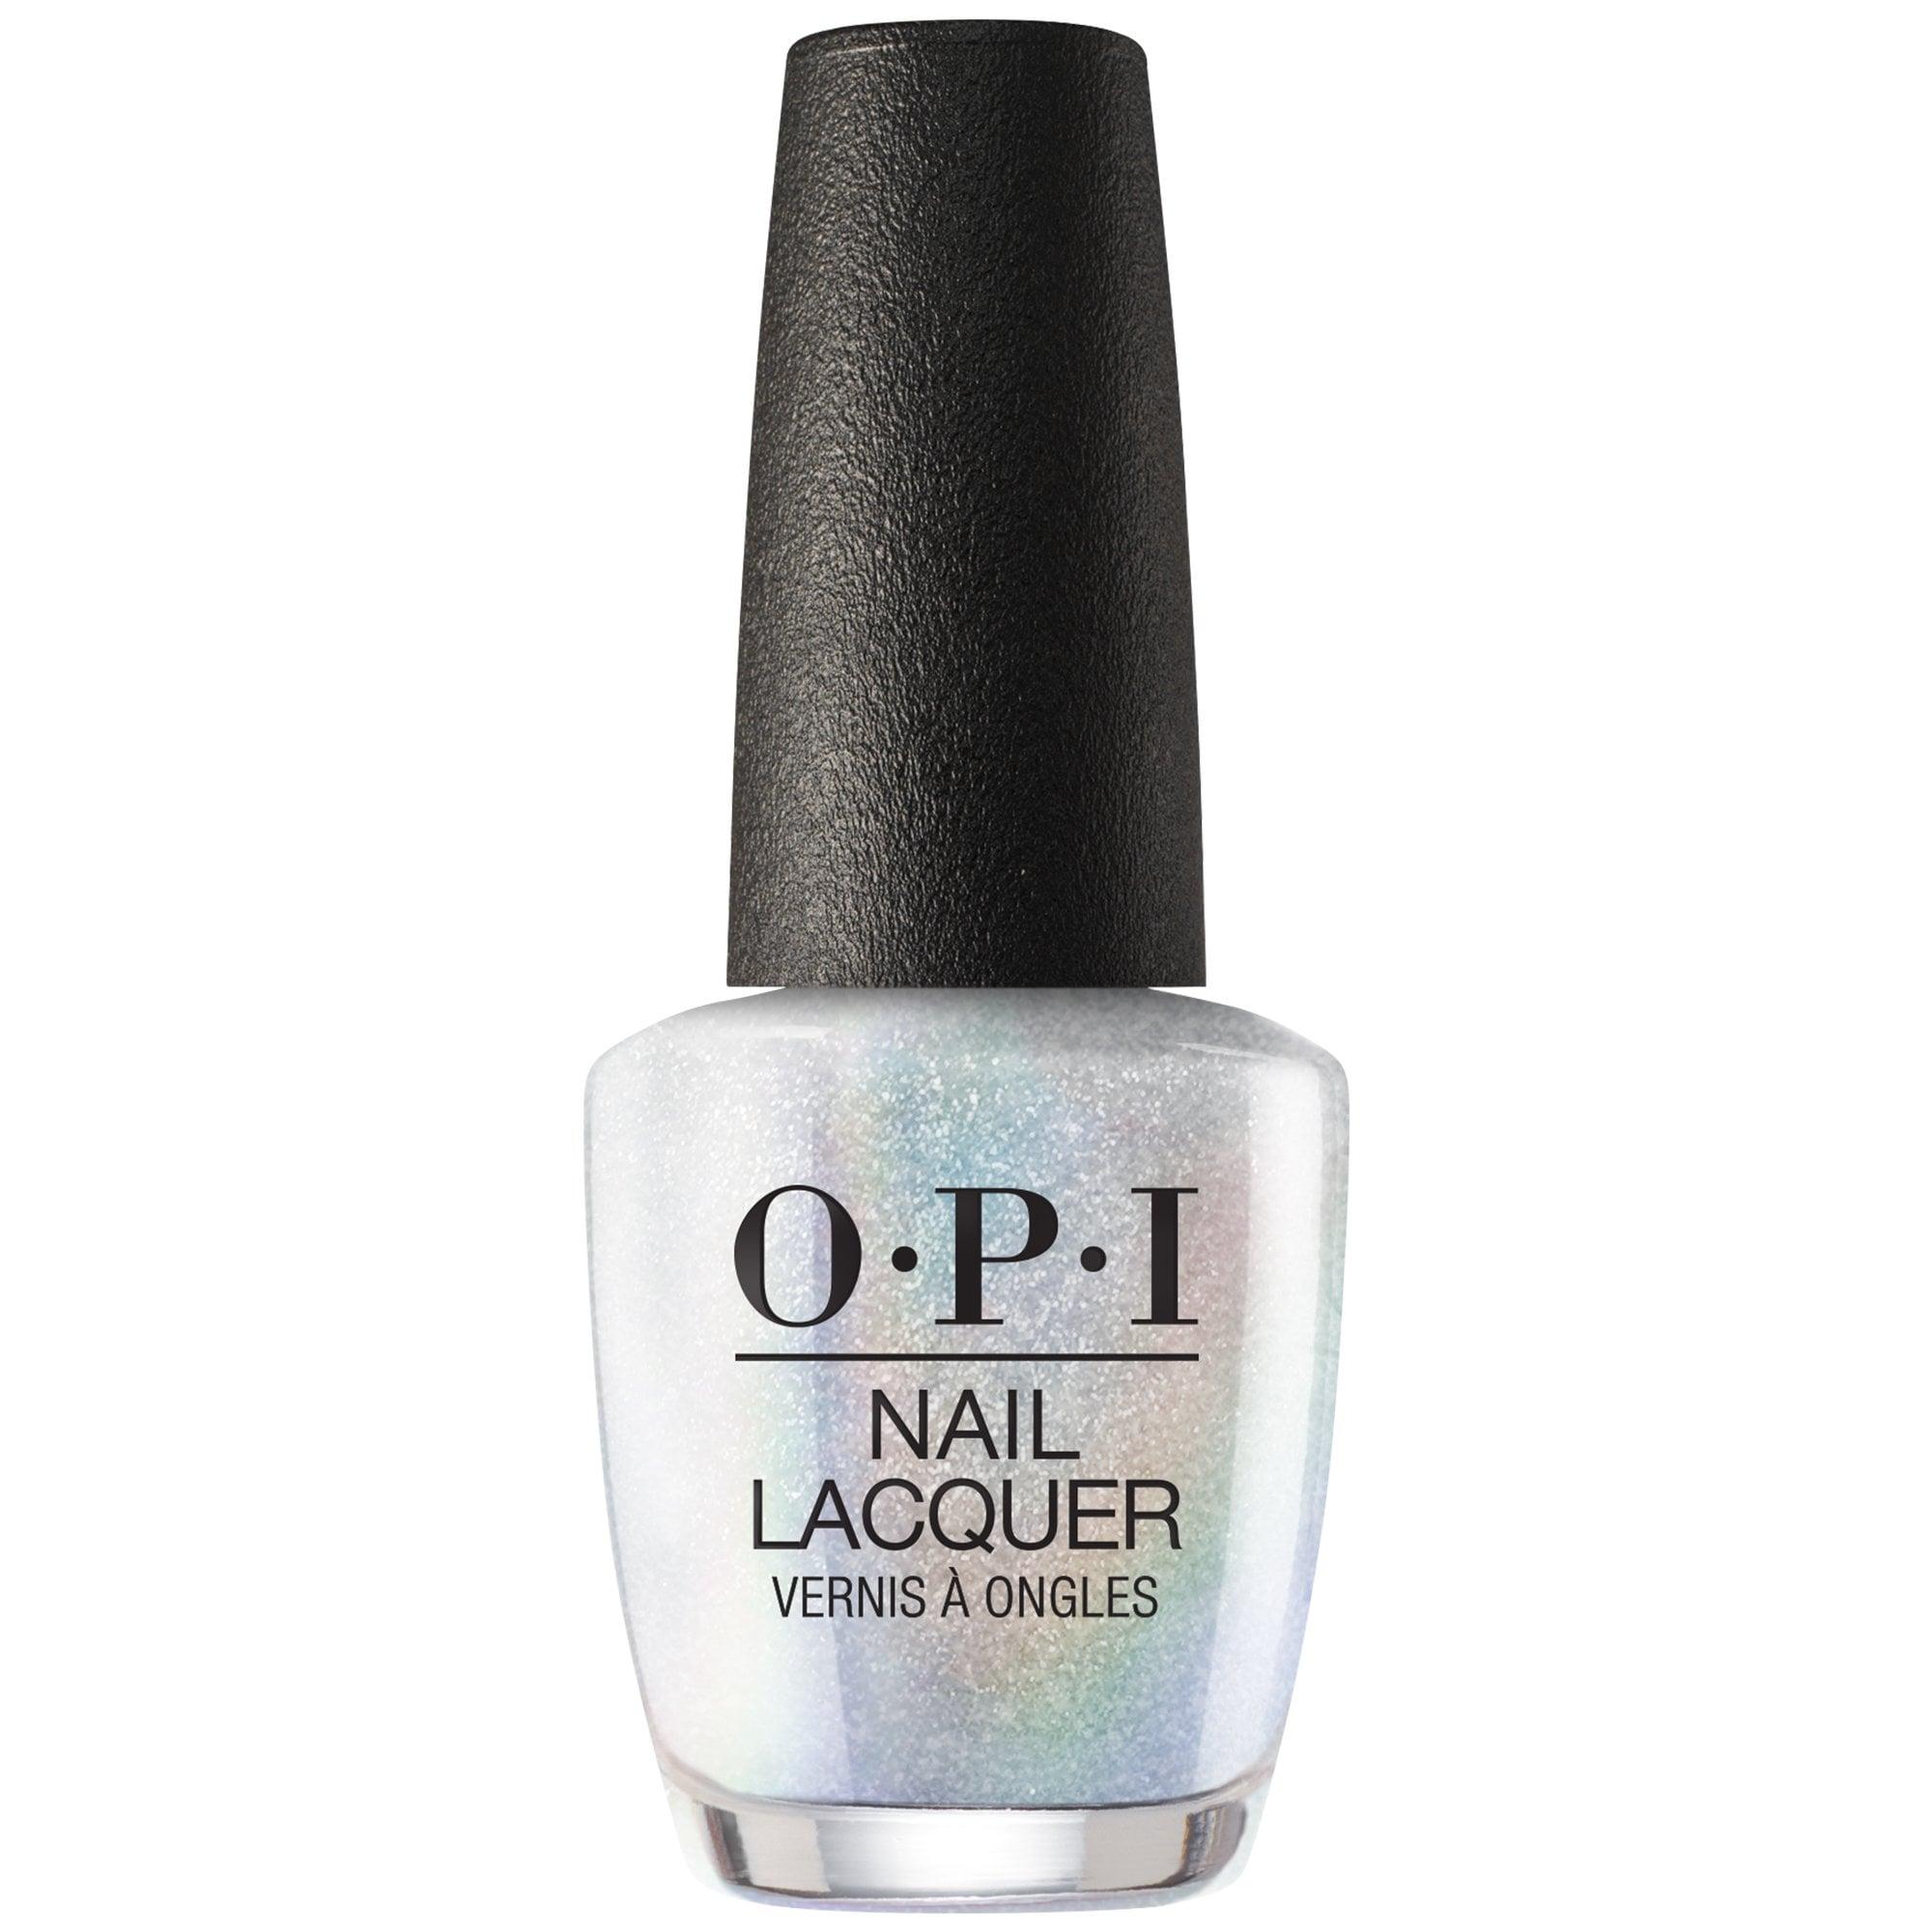 OIP Nutcracker Tinker, Thinker, Winker nail polish BeautyandHairdressing